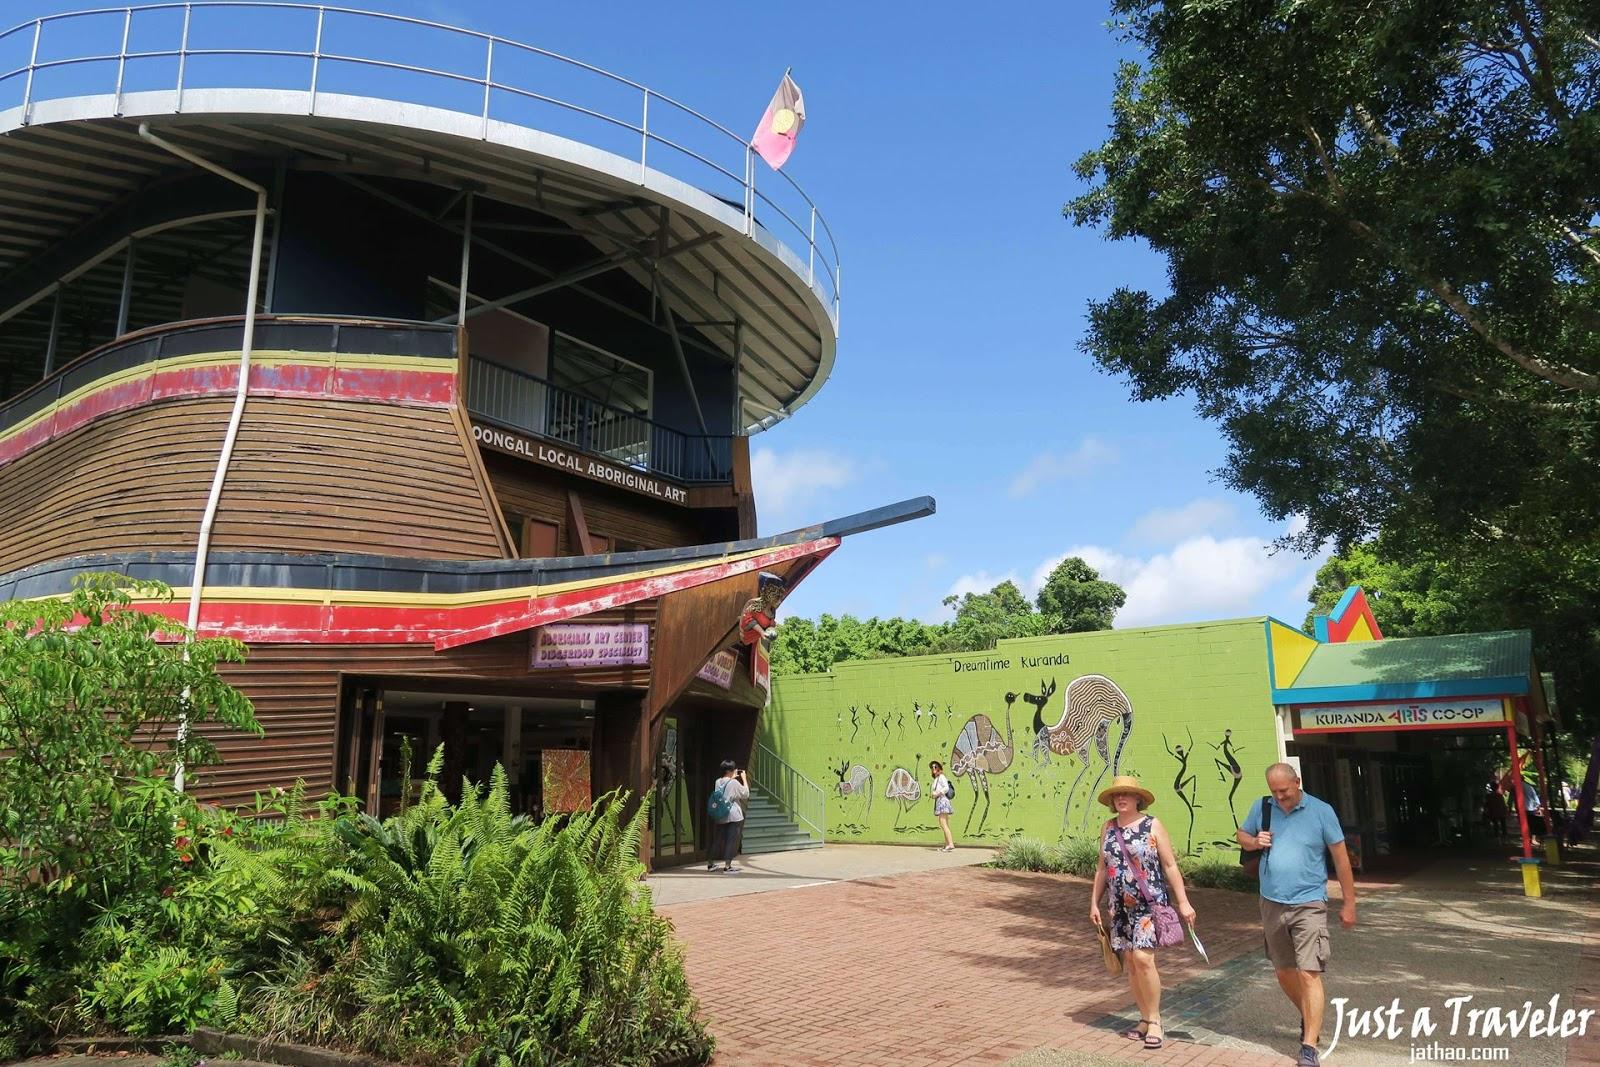 凱恩斯-景點-推薦-庫蘭達-旅遊-自由行-澳洲-Cairns-Tourist-Attraction-Kuranda-Travel-Australia